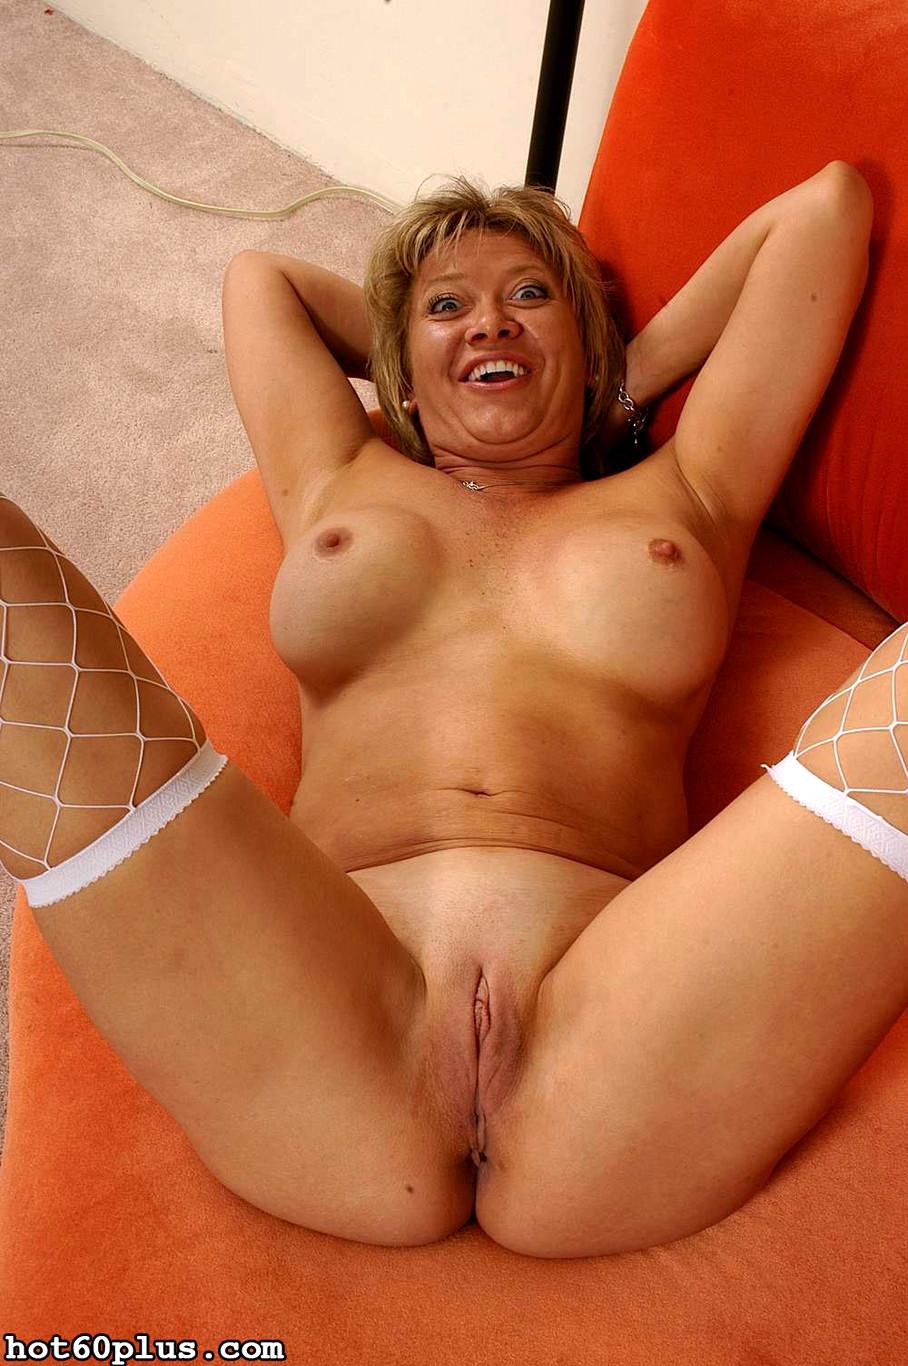 Jenna marshall nude